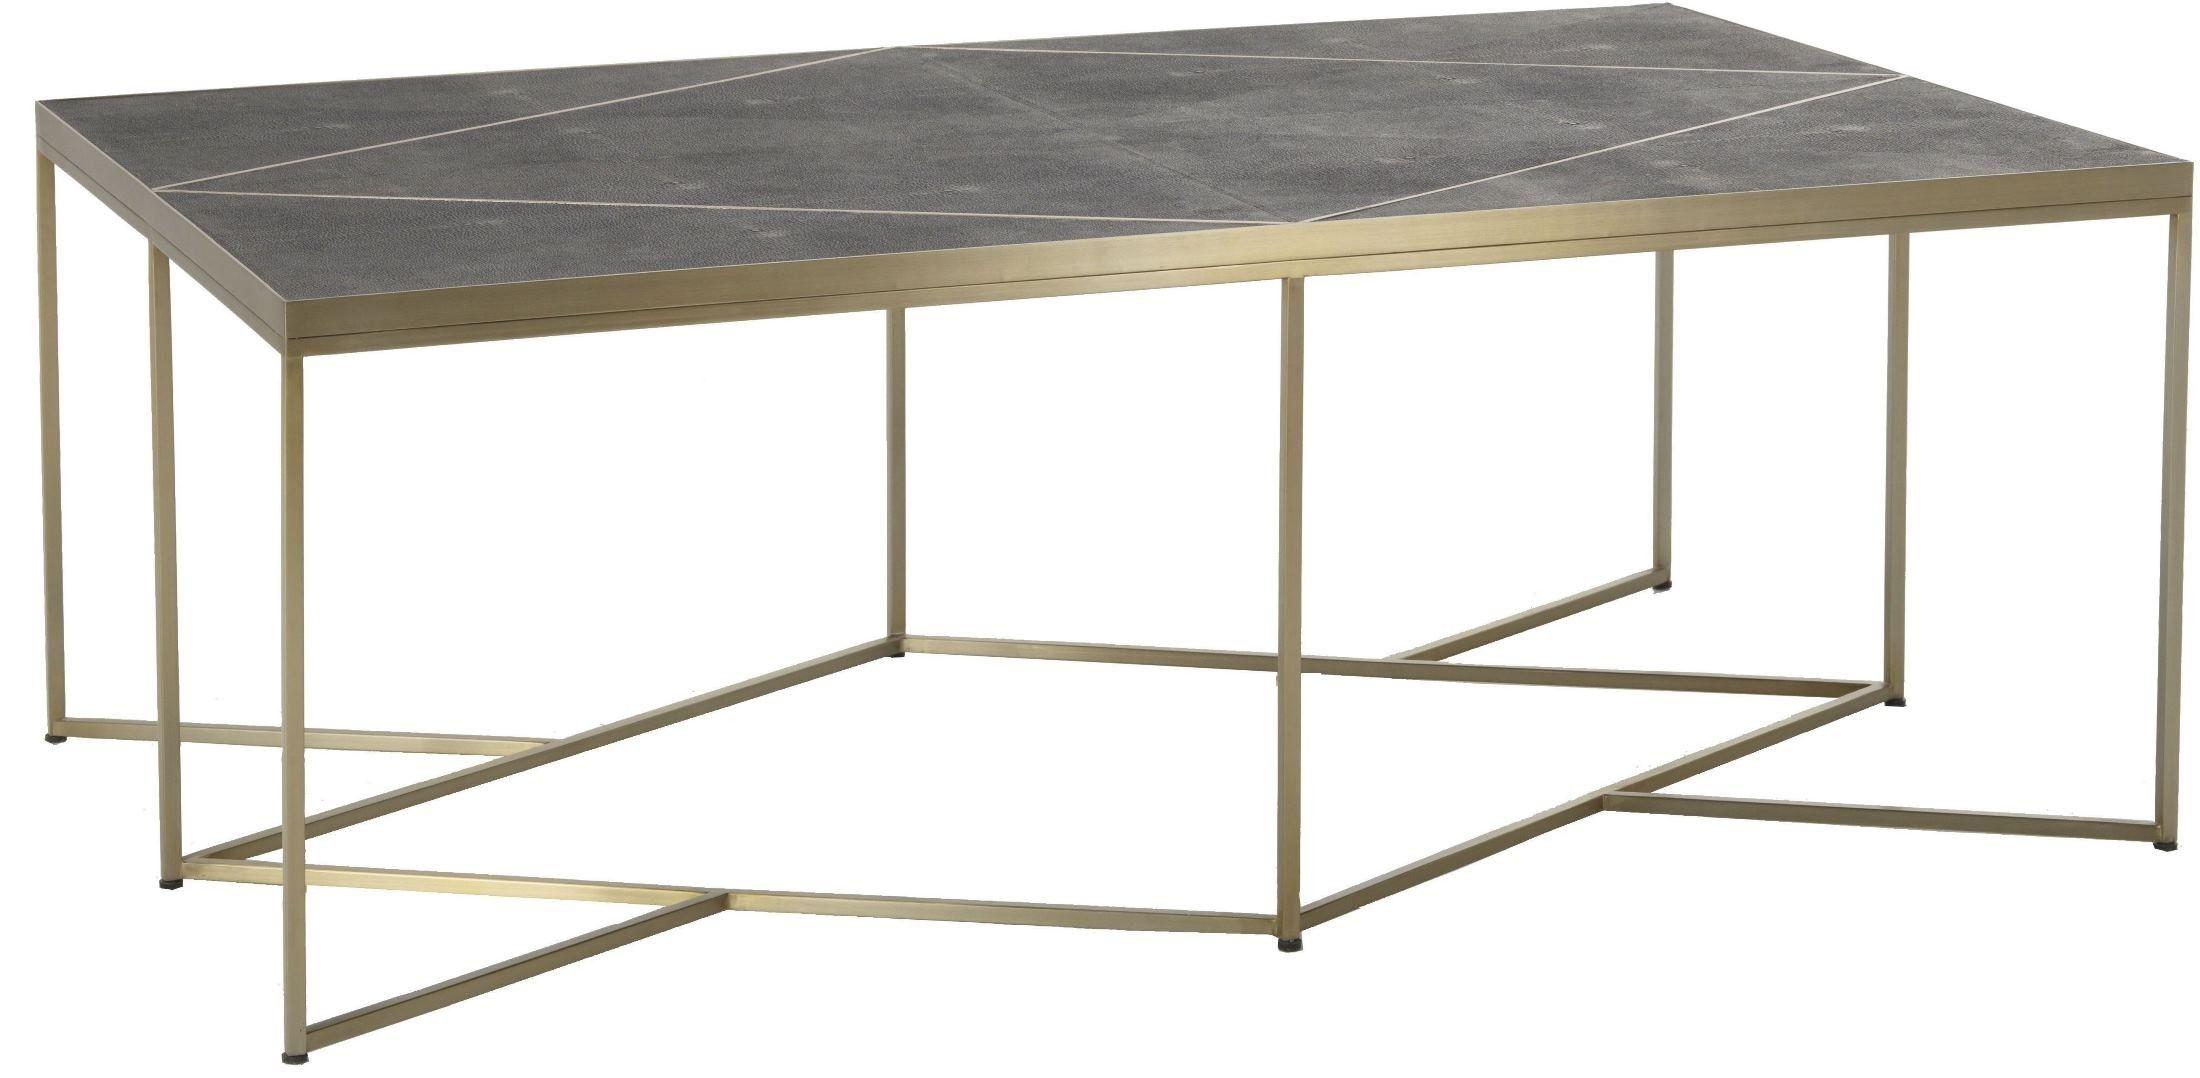 Solange Rectangular Acrylic 2 Tier Coffee Table 21w44 Lamps Plus Coffee Table Design Modern Acrylic Coffee Table Living Room Coffee Table [ 1113 x 1173 Pixel ]